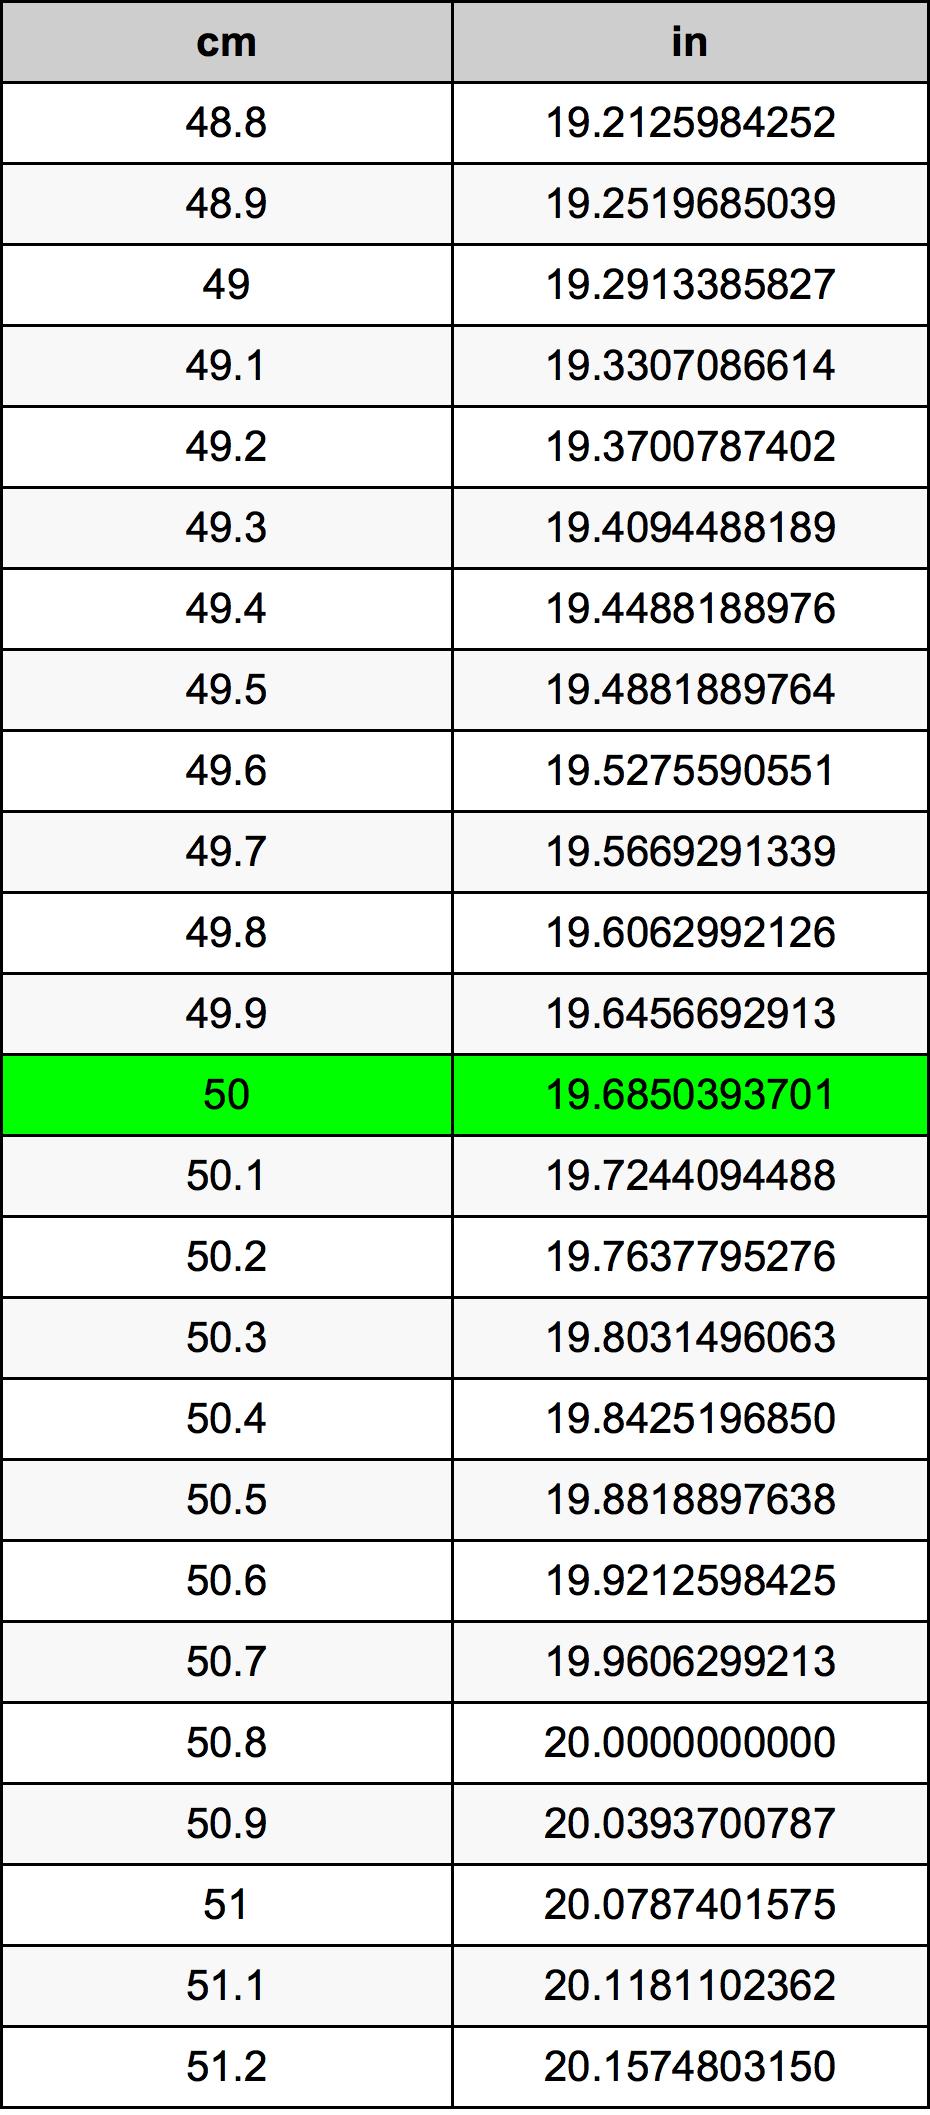 50 Centimeter Table